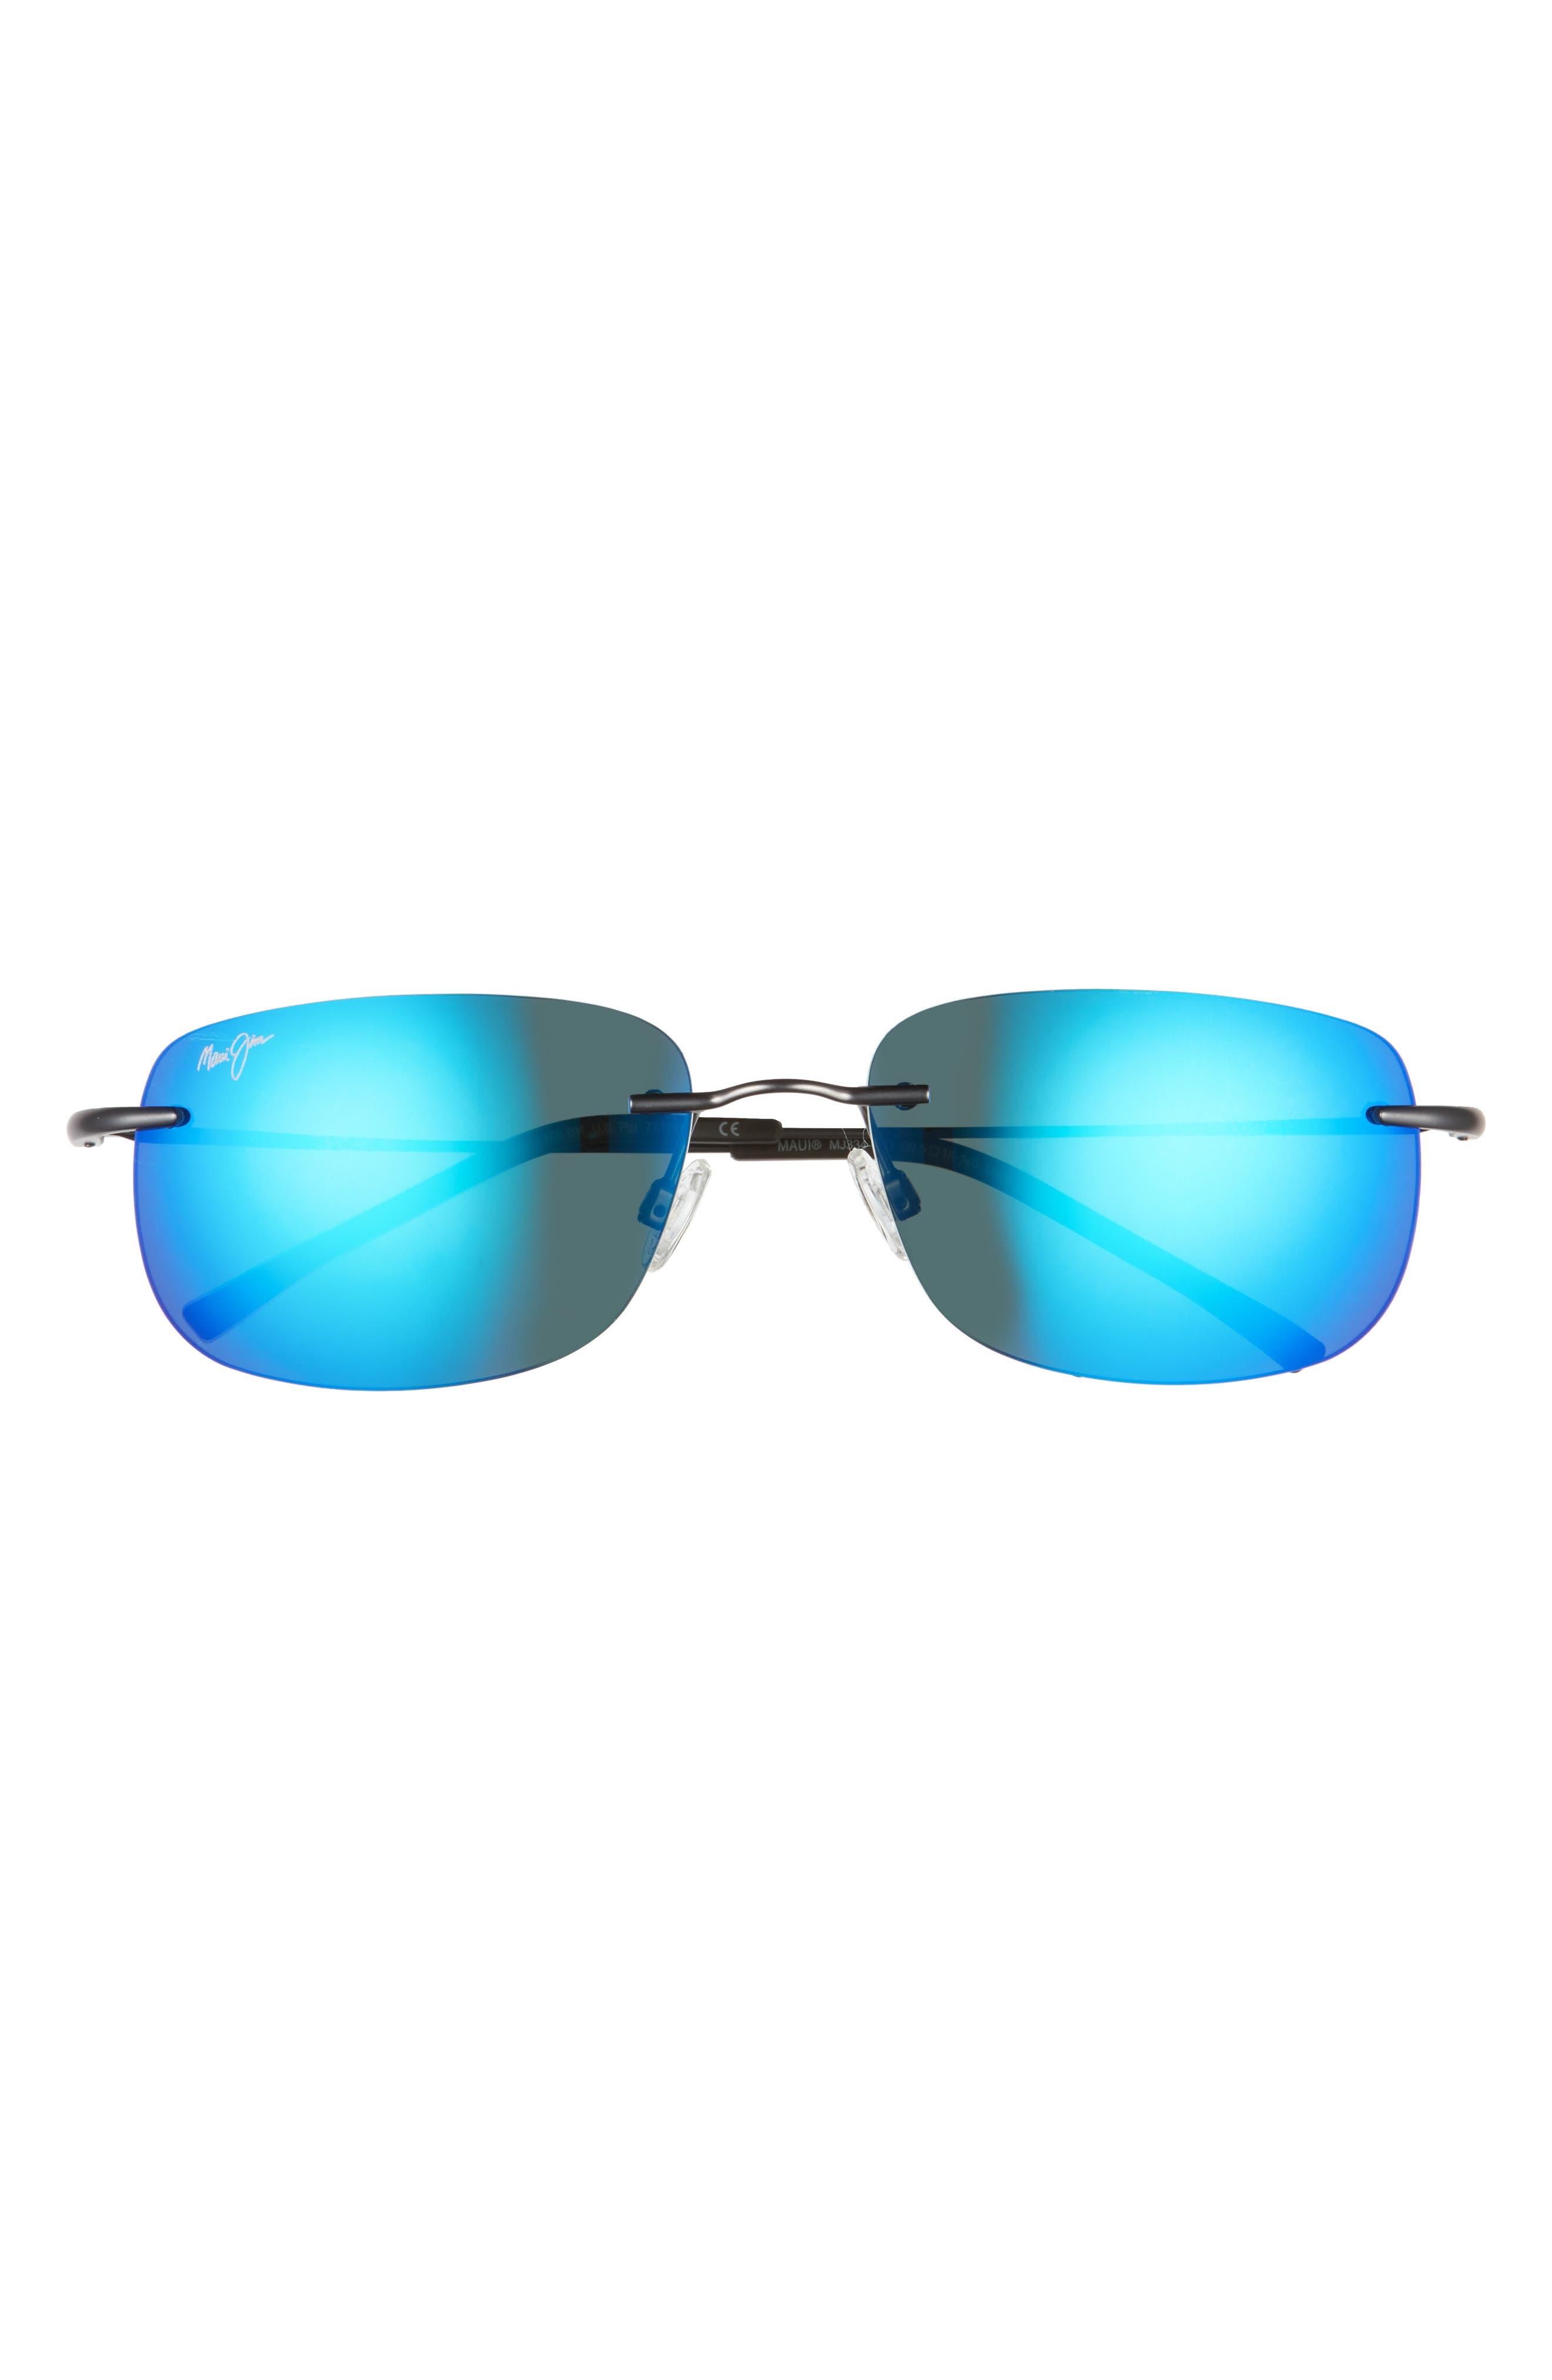 Ohai 59.5mm Polarized Rimless Rectangular Sunglasses